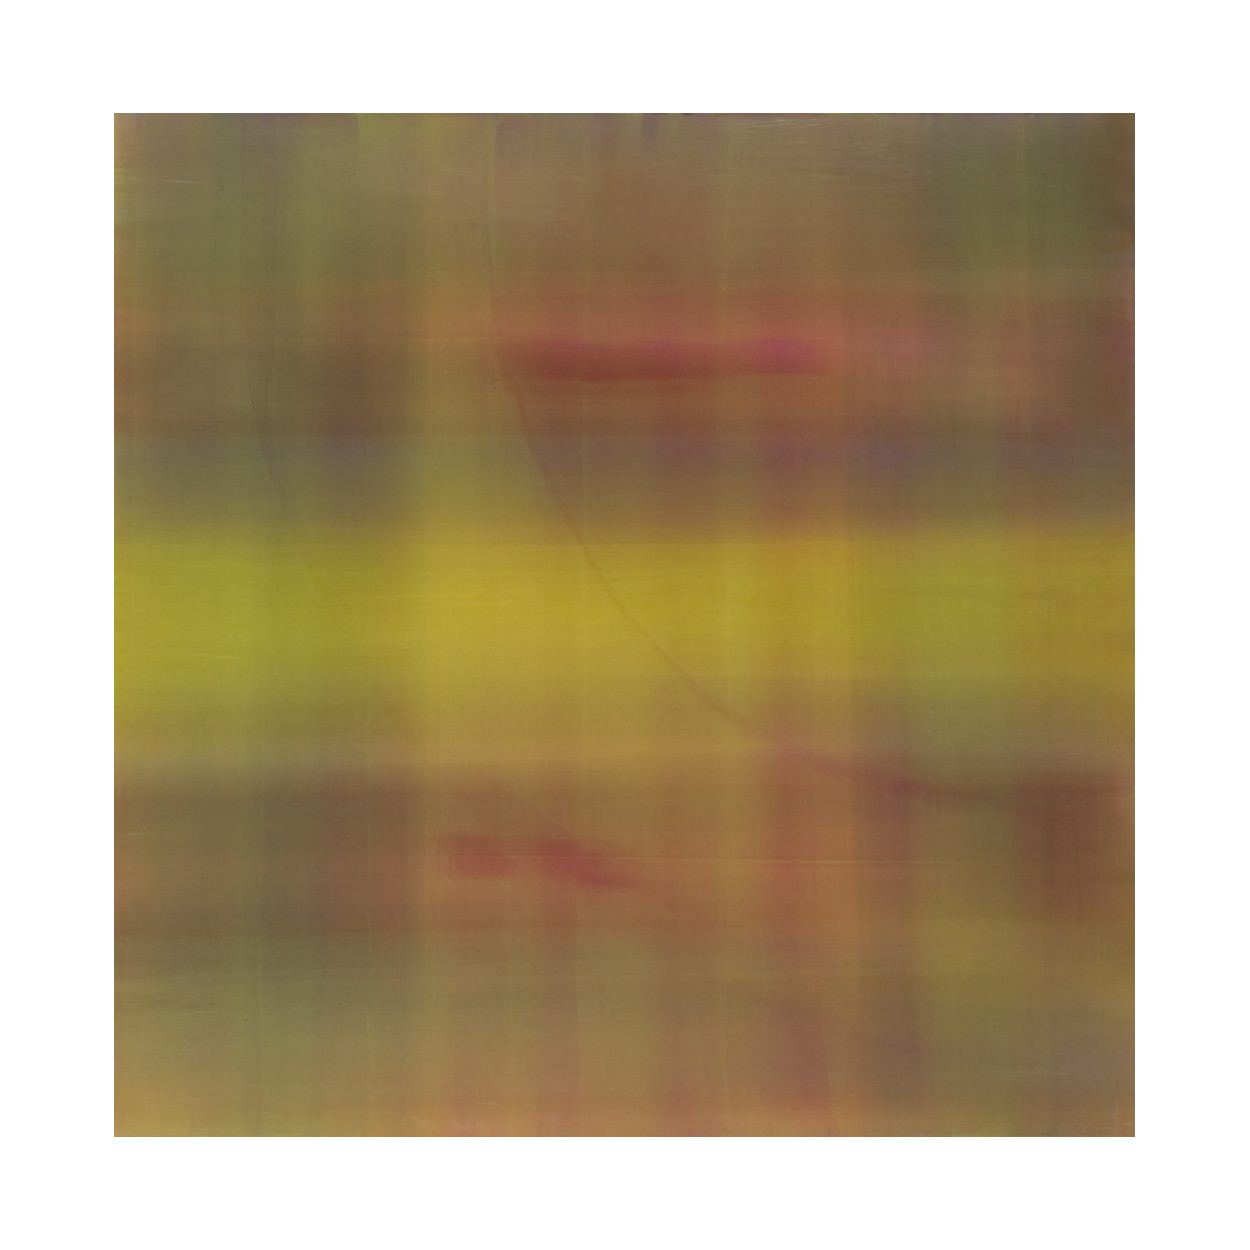 Tetrachromat #5  Acrylic on panel 36x36x2.5 inches  2008